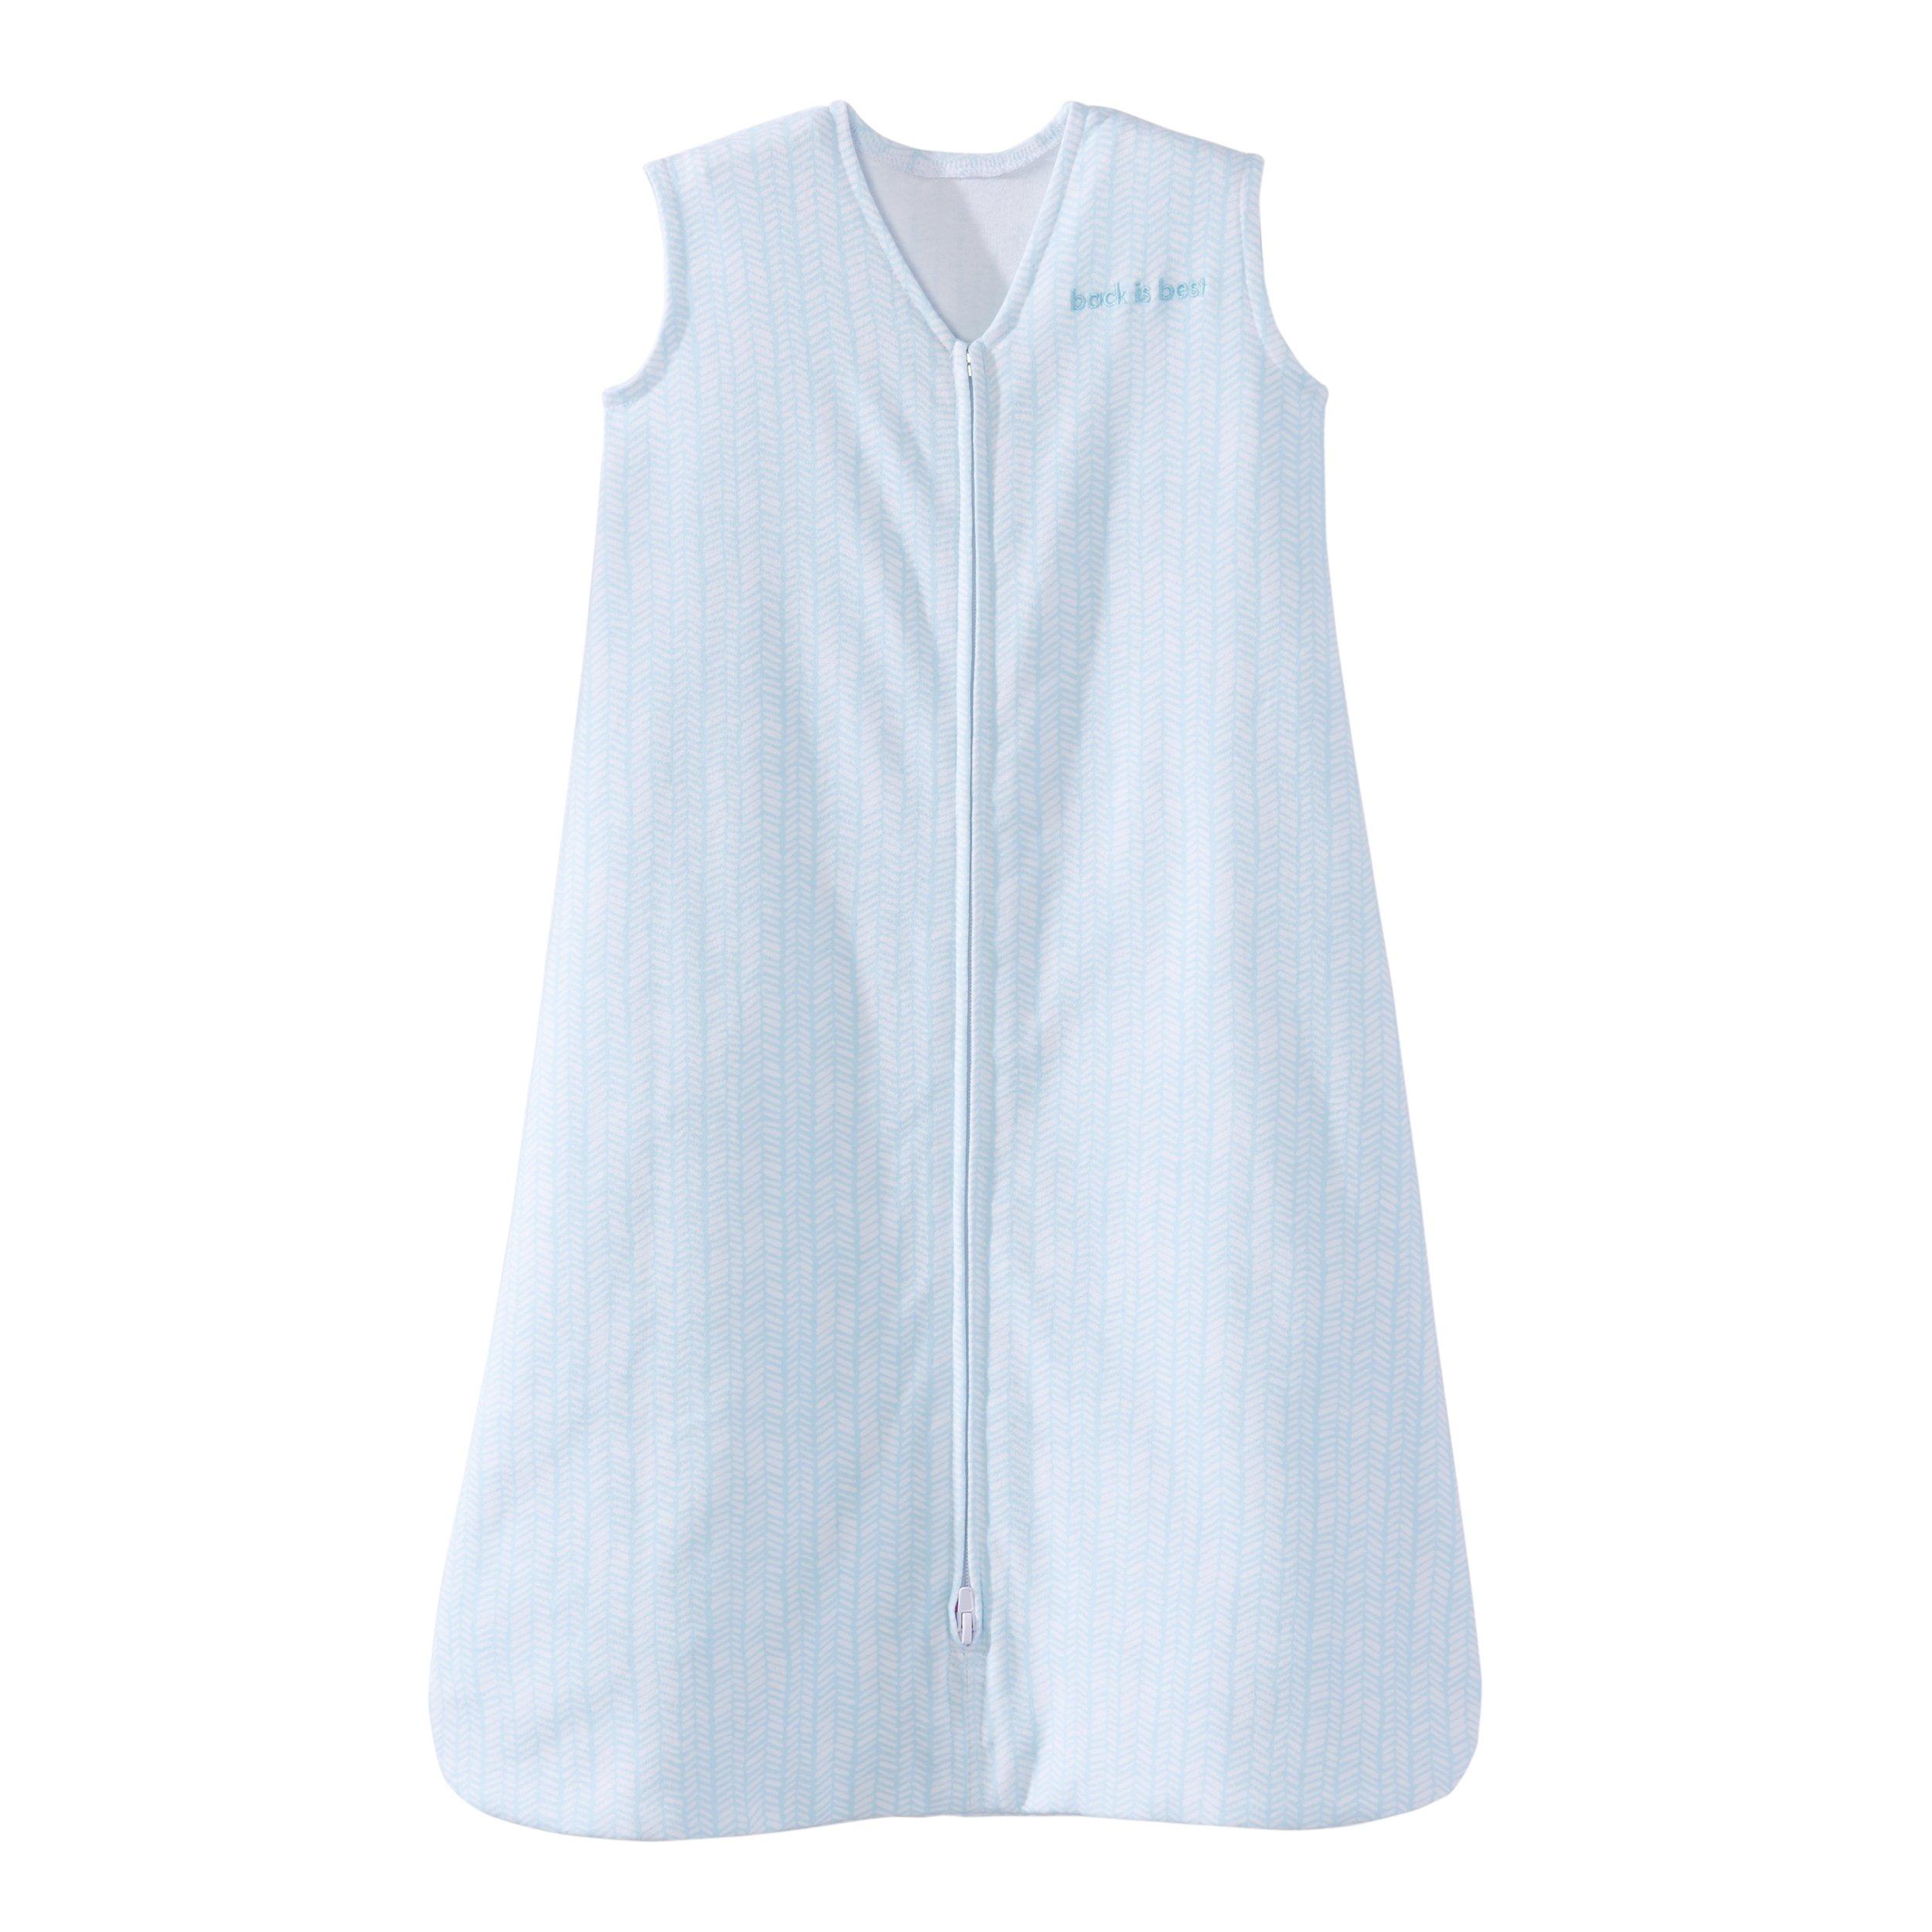 Halo SleepSack 100% Cotton Wearable Blanket, Aqua Feather, Medium